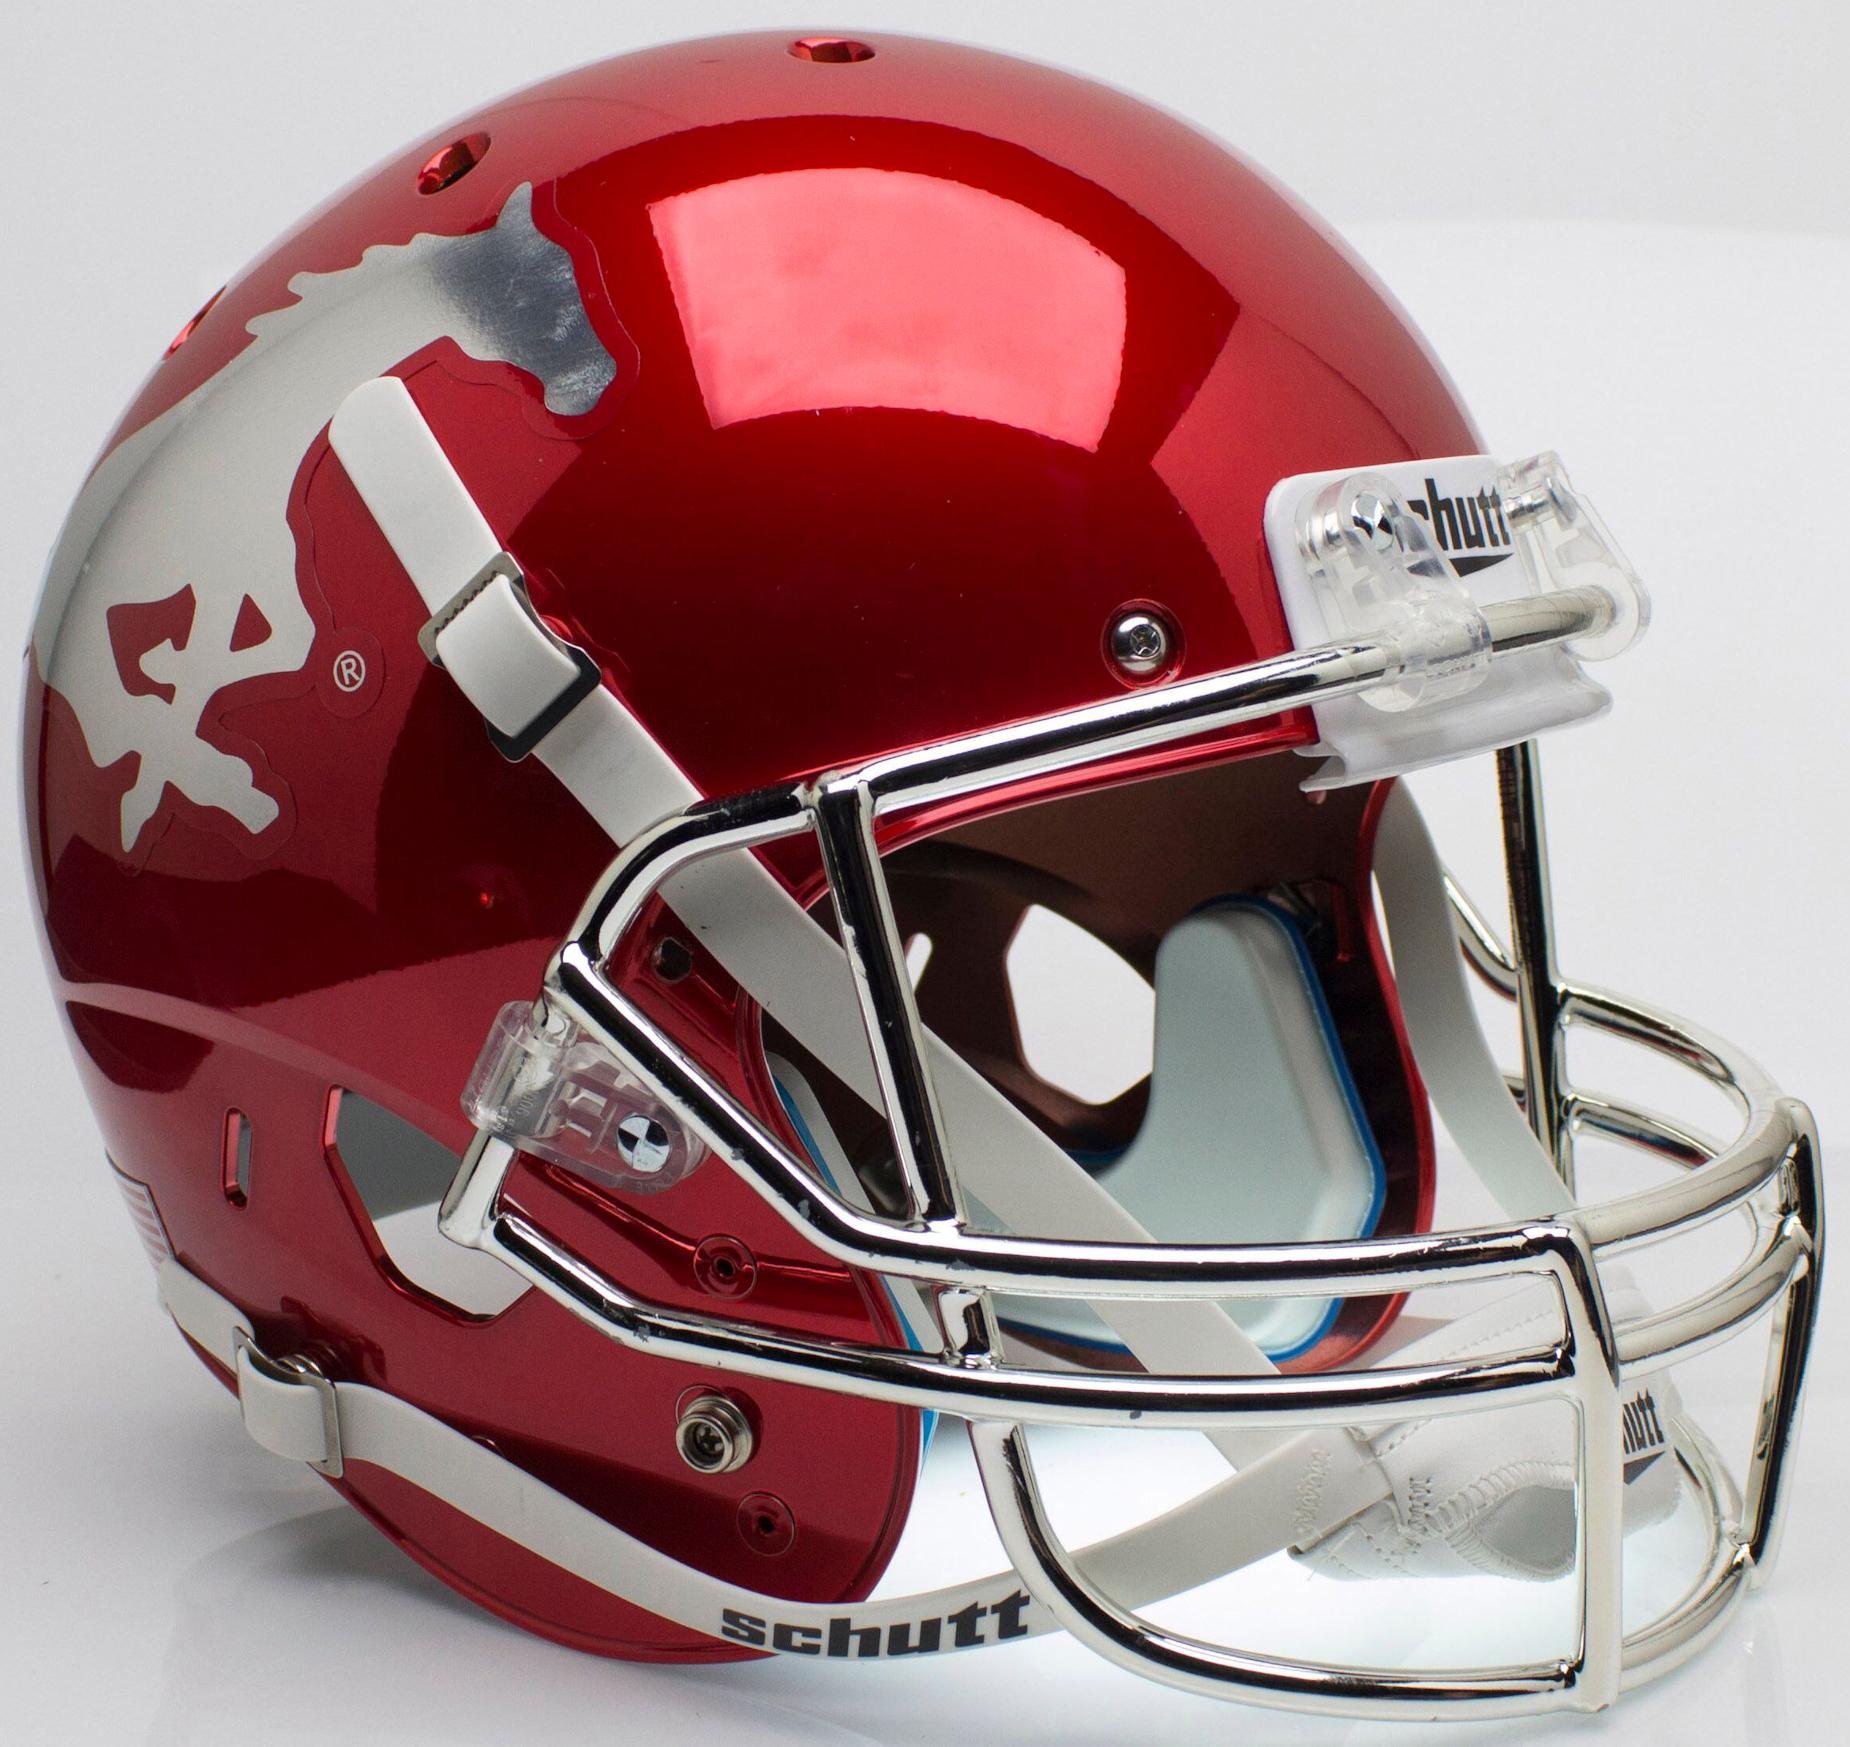 Southern Methodist (SMU) Mustangs Full XP Replica Football Helmet Schutt <B>Red Chrome With Chrome Mask</B>